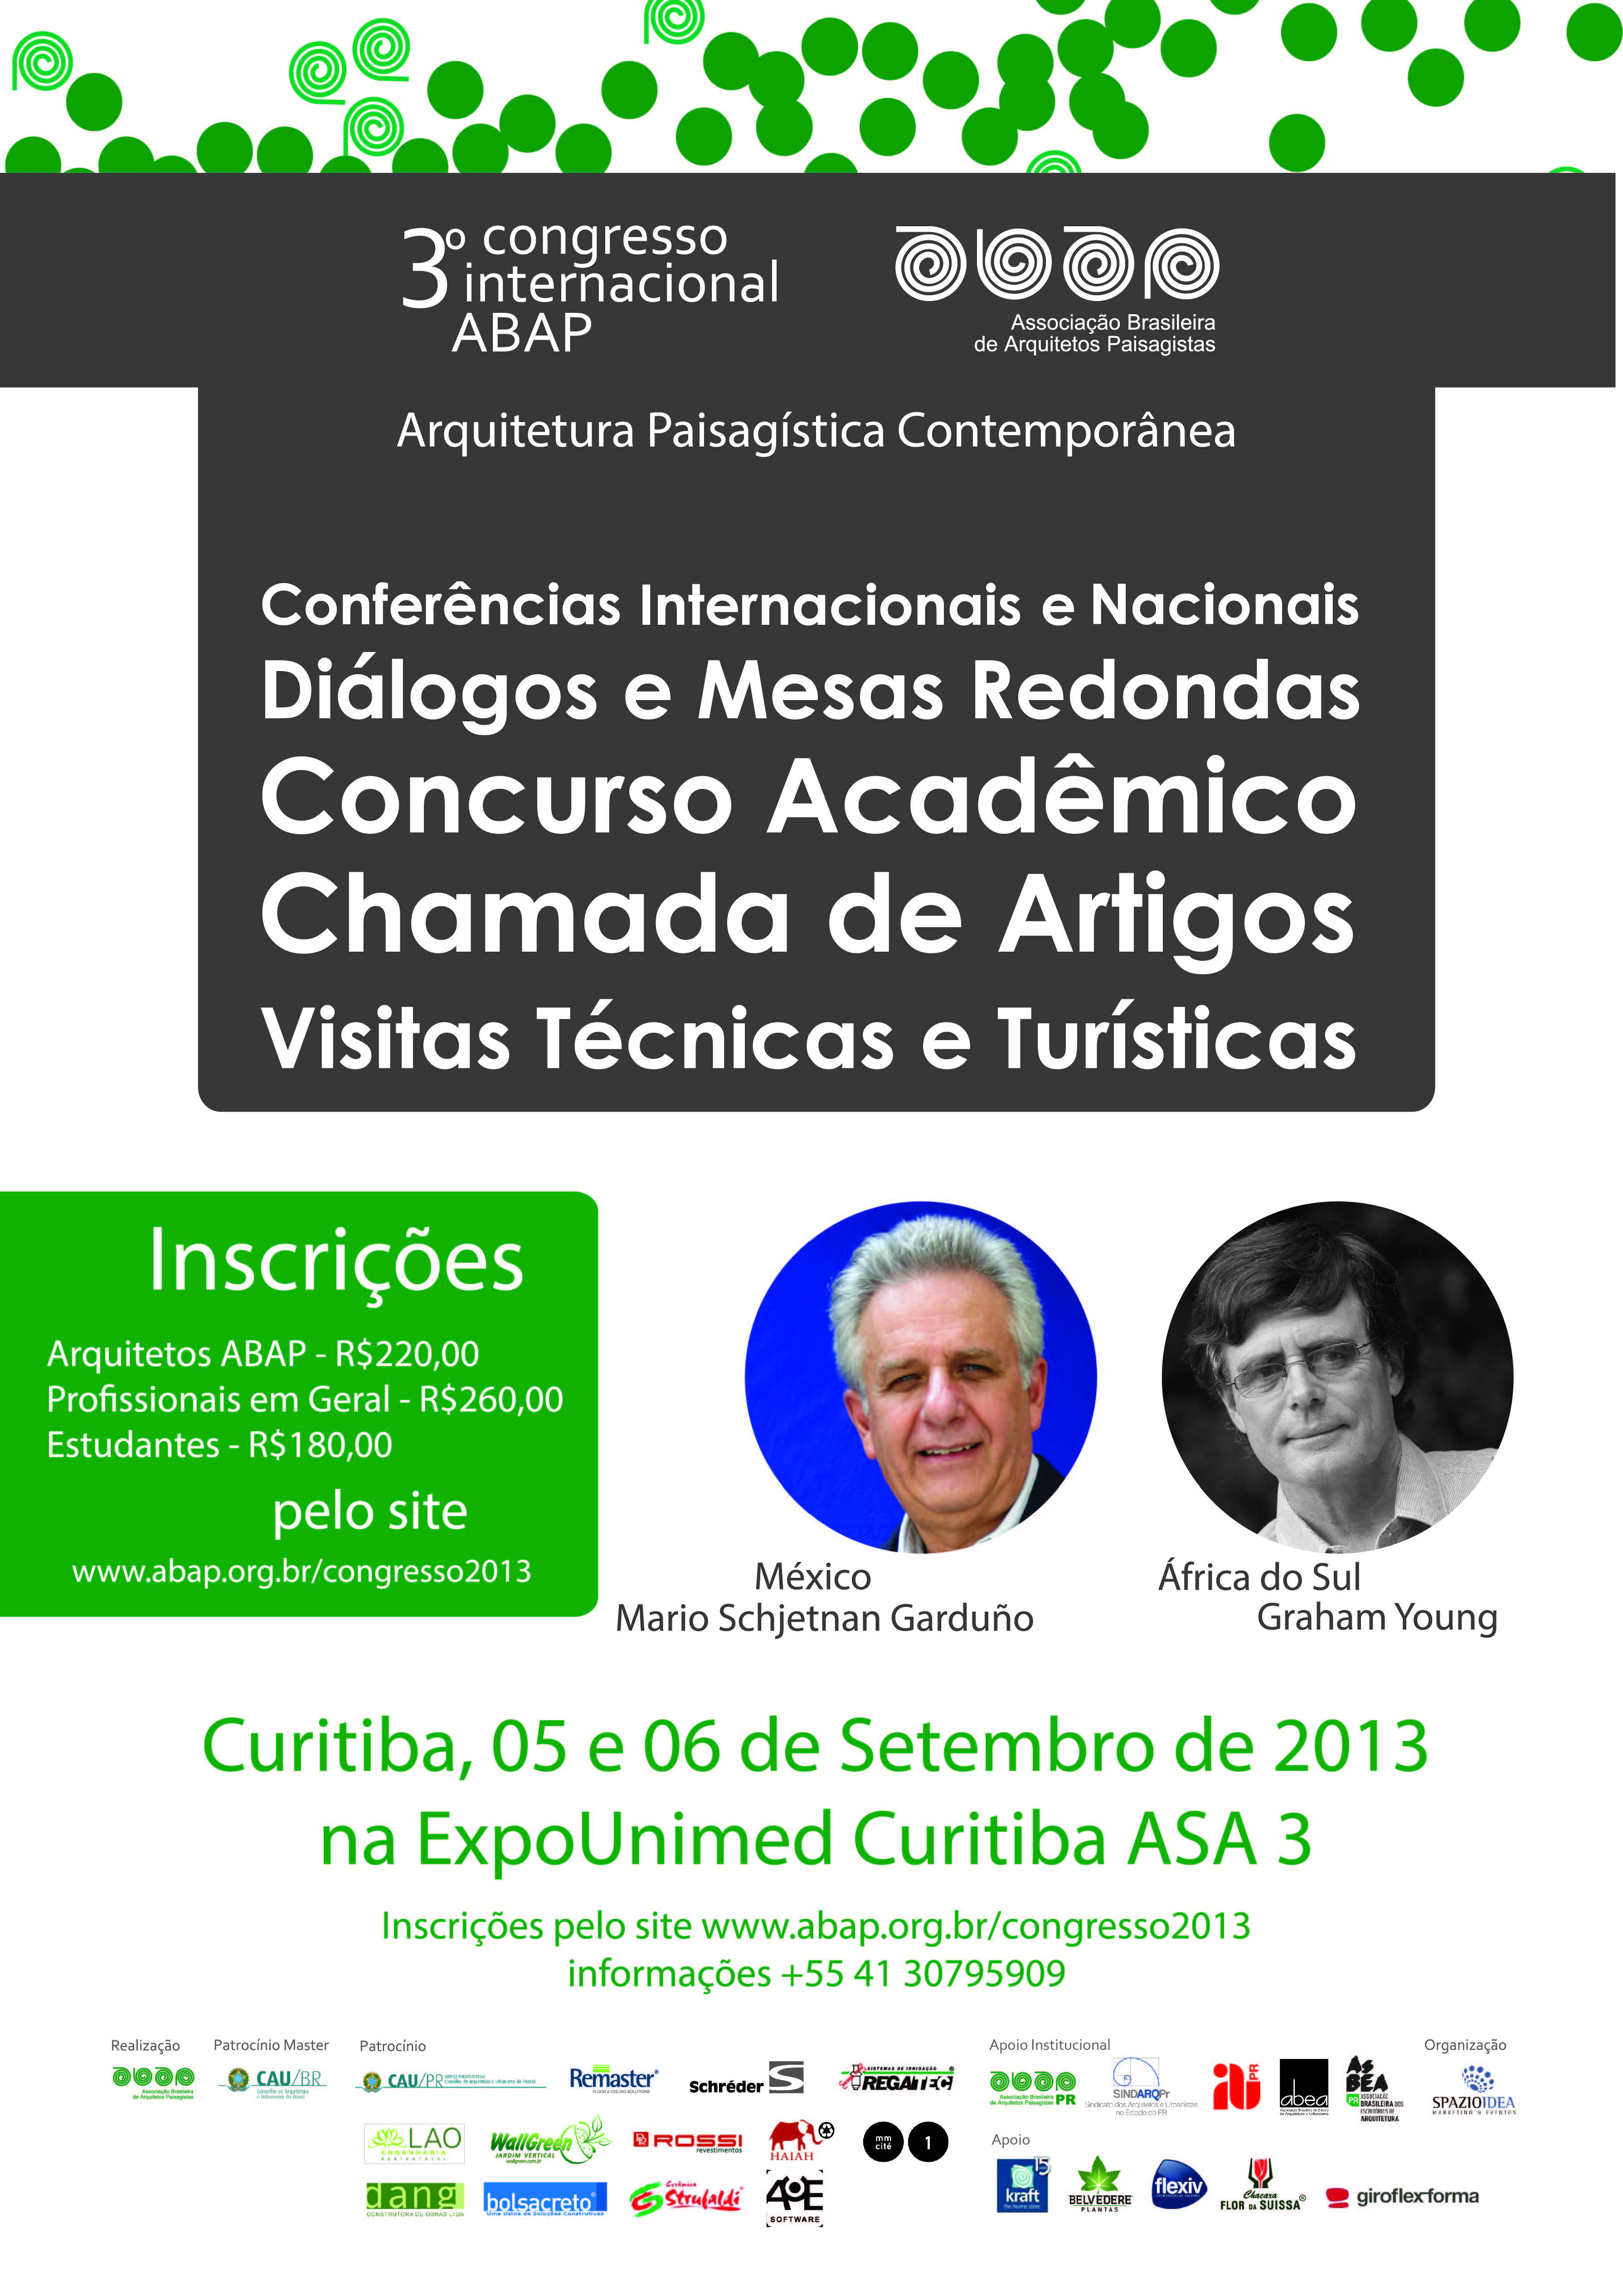 ABAP promove Congresso Internacional em Curitiba